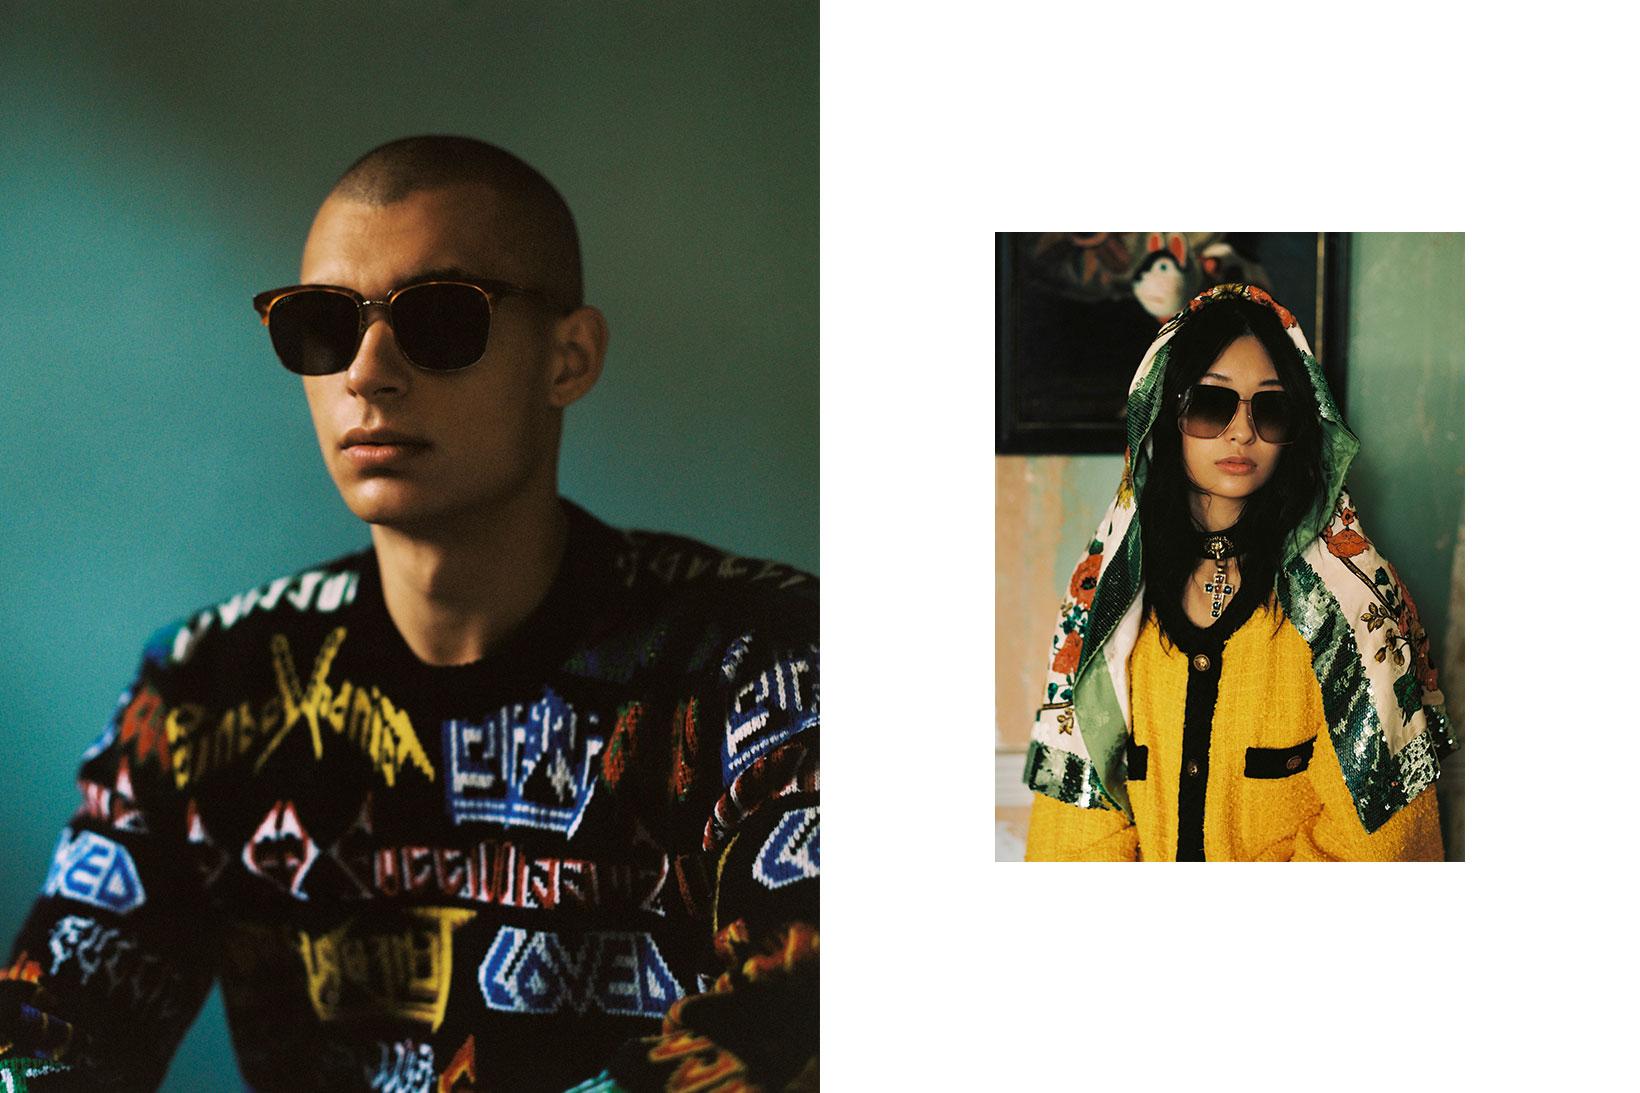 Gucci-eyewear-collection-fall-winter-2018-3.jpg